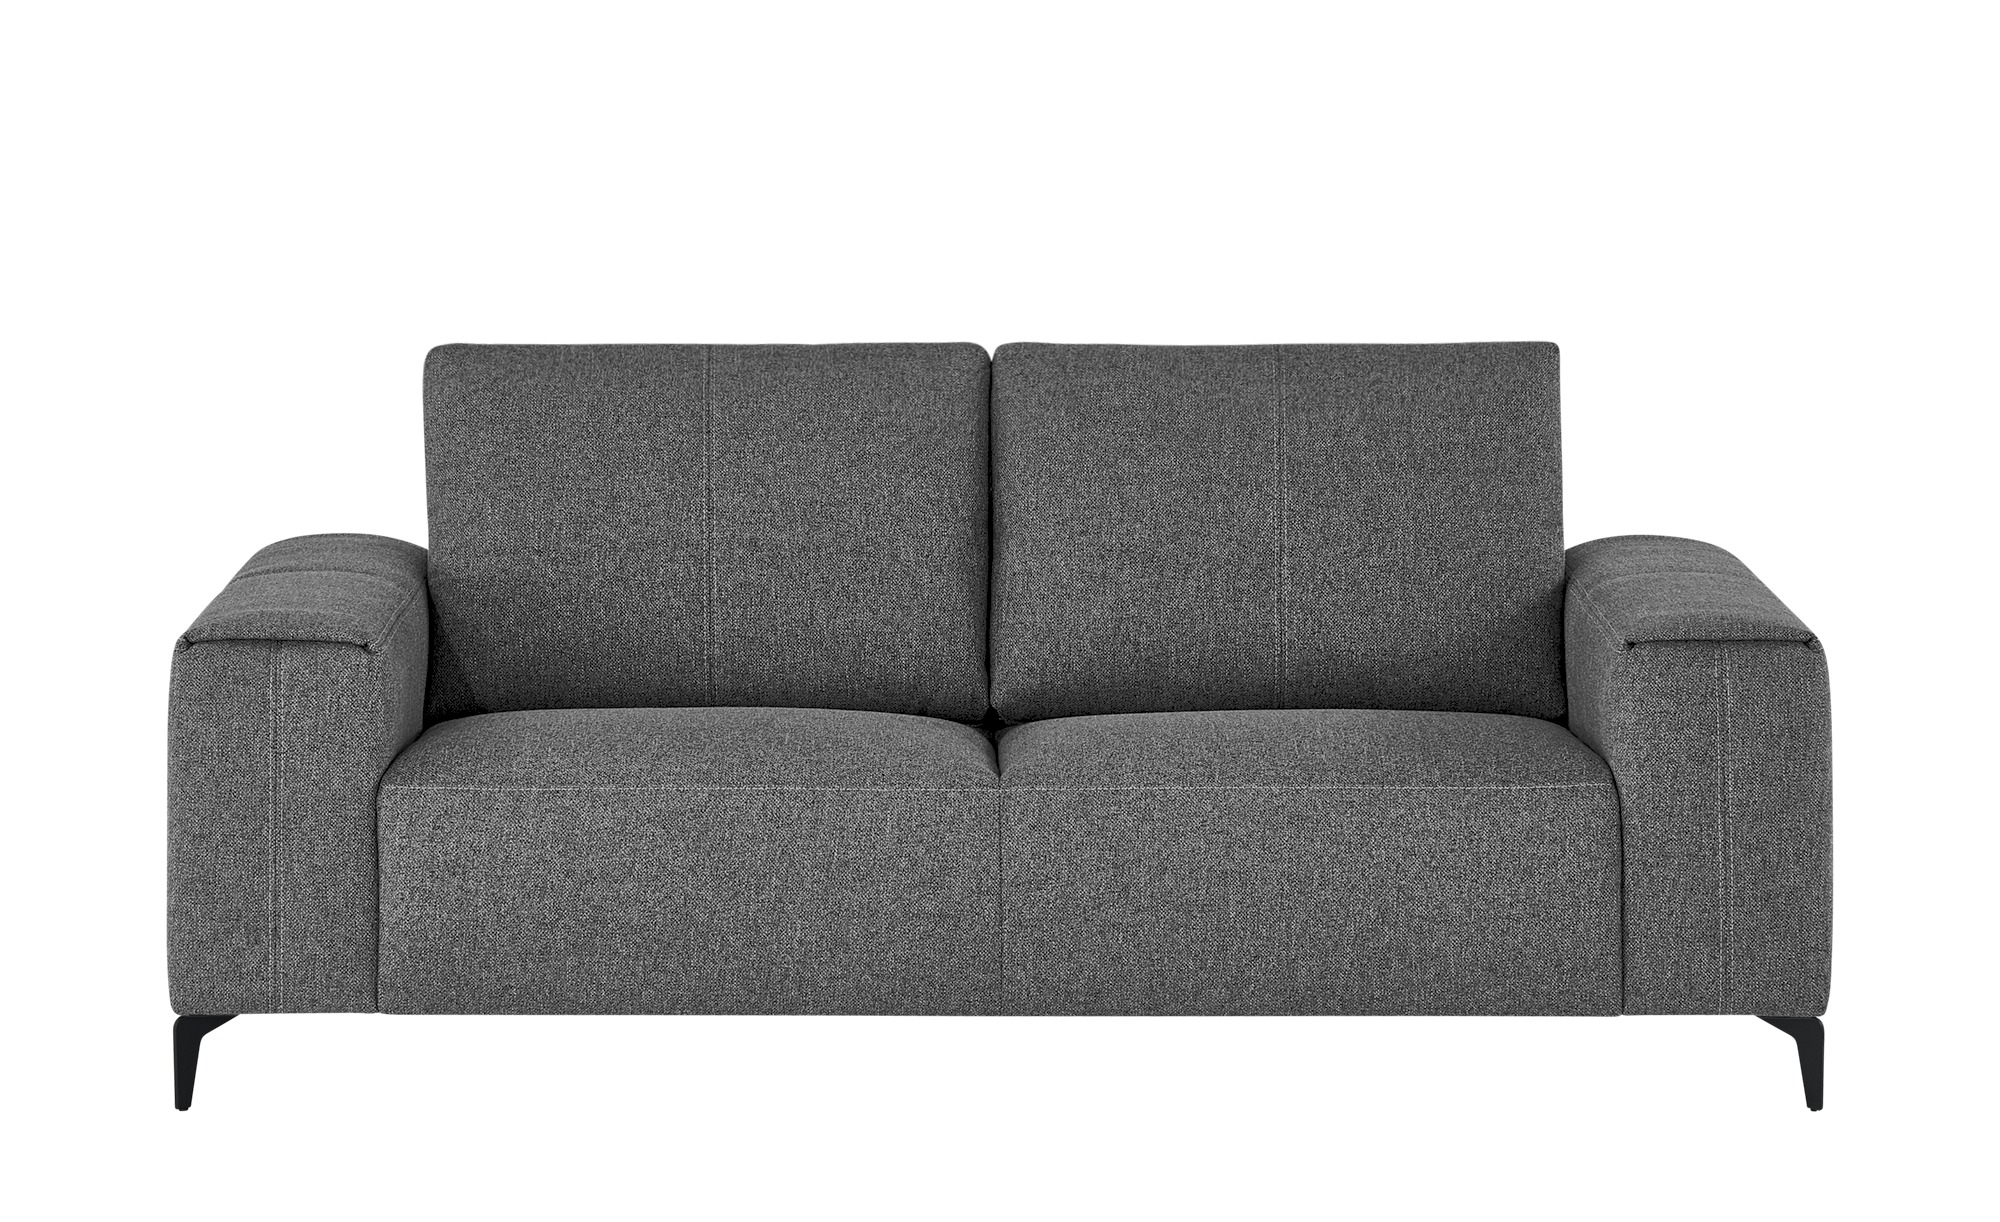 smart Sofa  Gabriela ¦ grau ¦ Maße (cm): B: 202 H: 90 T: 91 Polstermöbel > Sofas > 2-Sitzer - Höffner